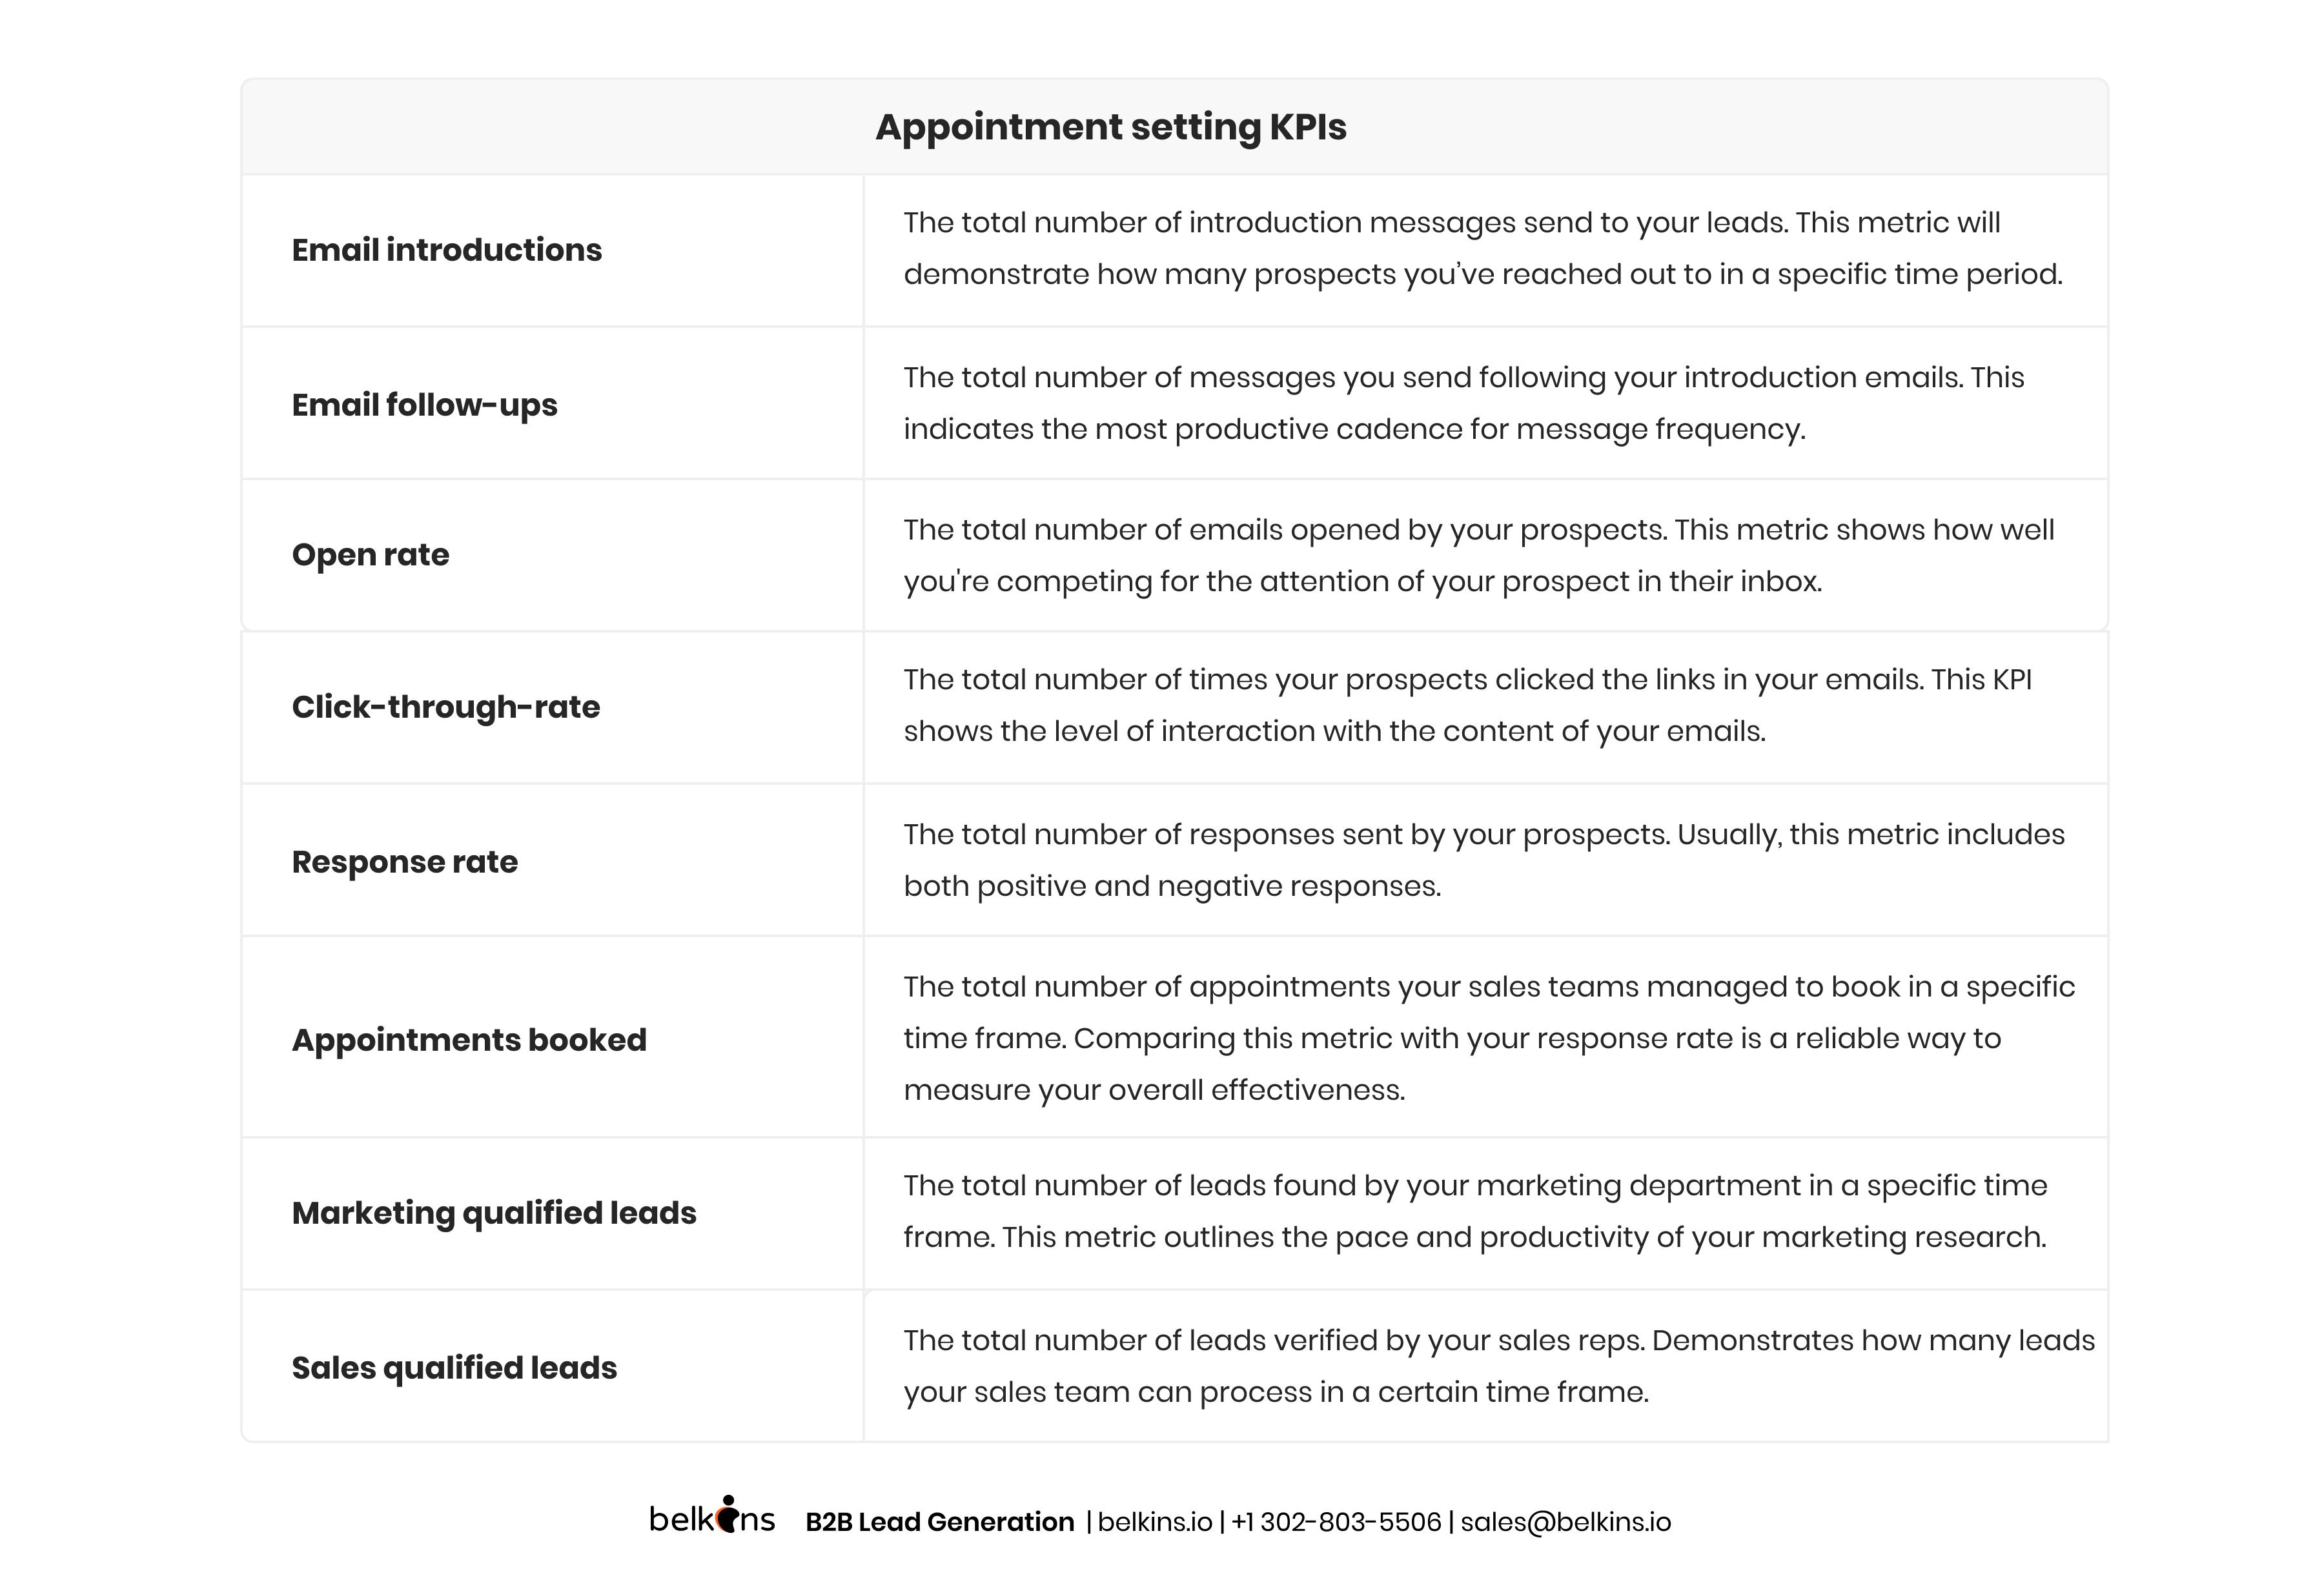 Appointmet_setting_kpis